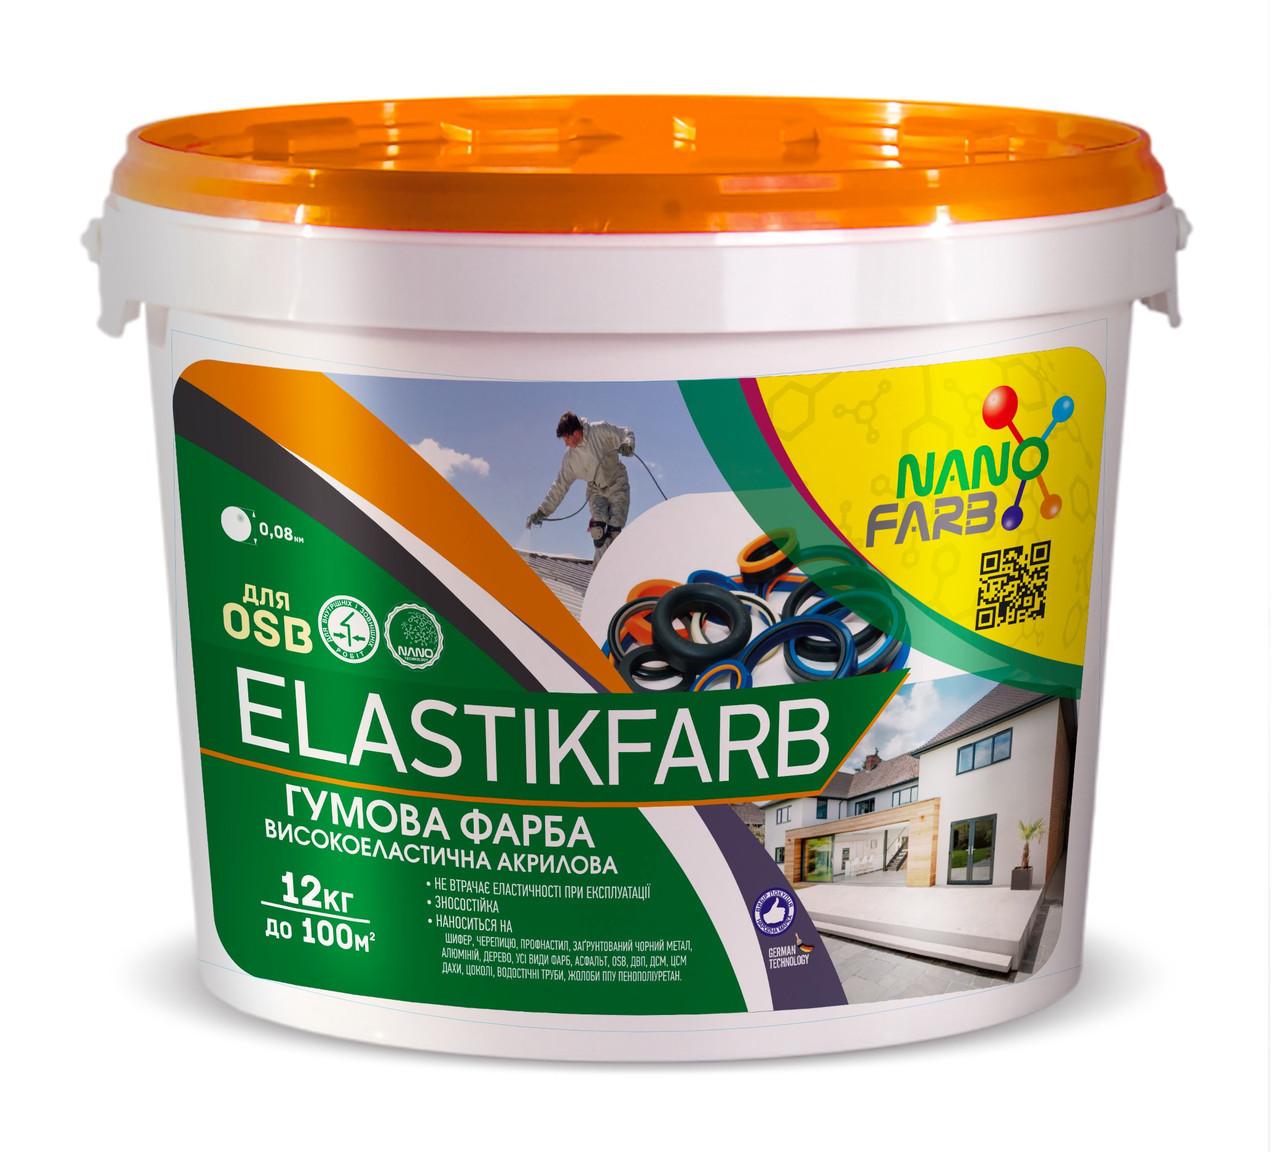 Резиновая краска Elastikfarbe Nano farb TR Base 12 кг